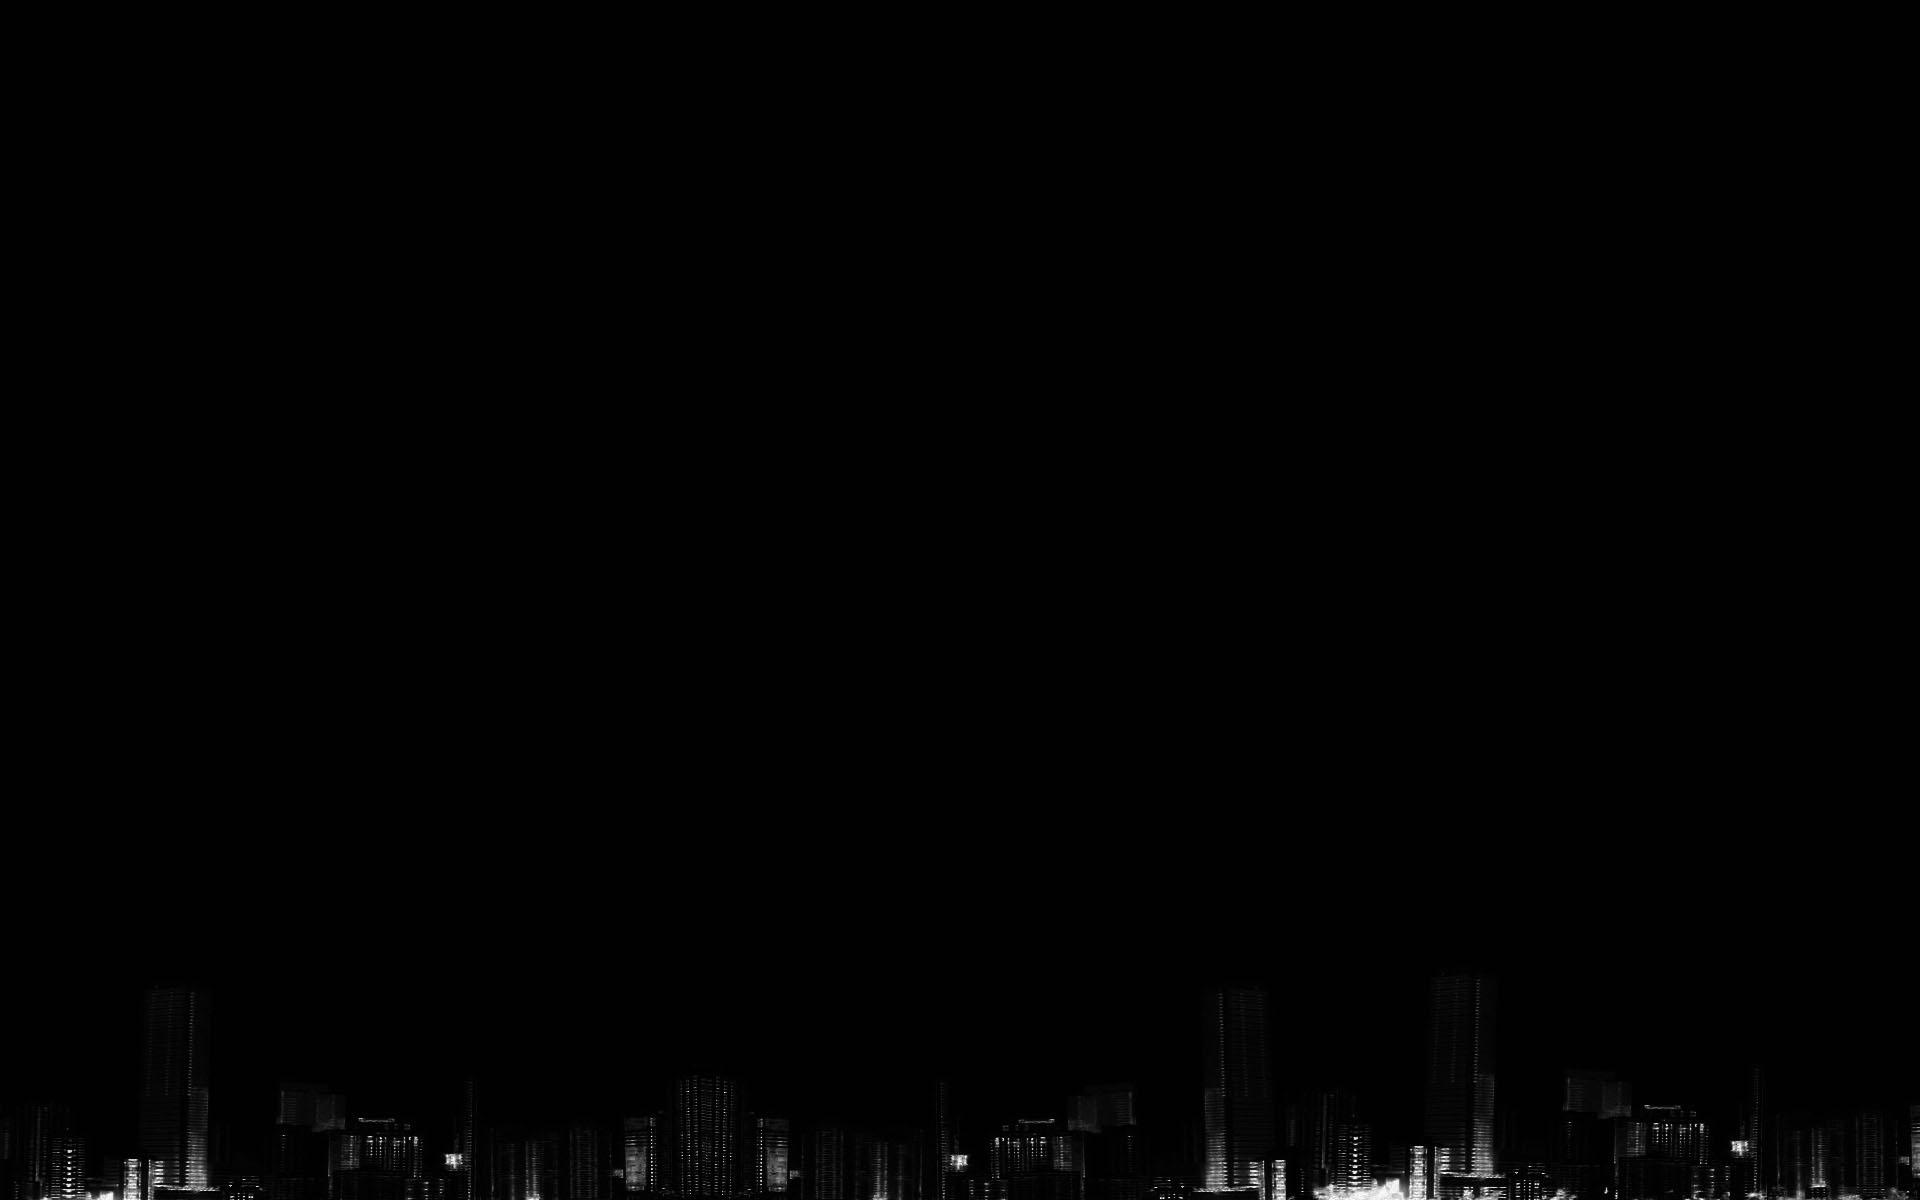 black desktop wallpaper 17 cool hd wallpaper